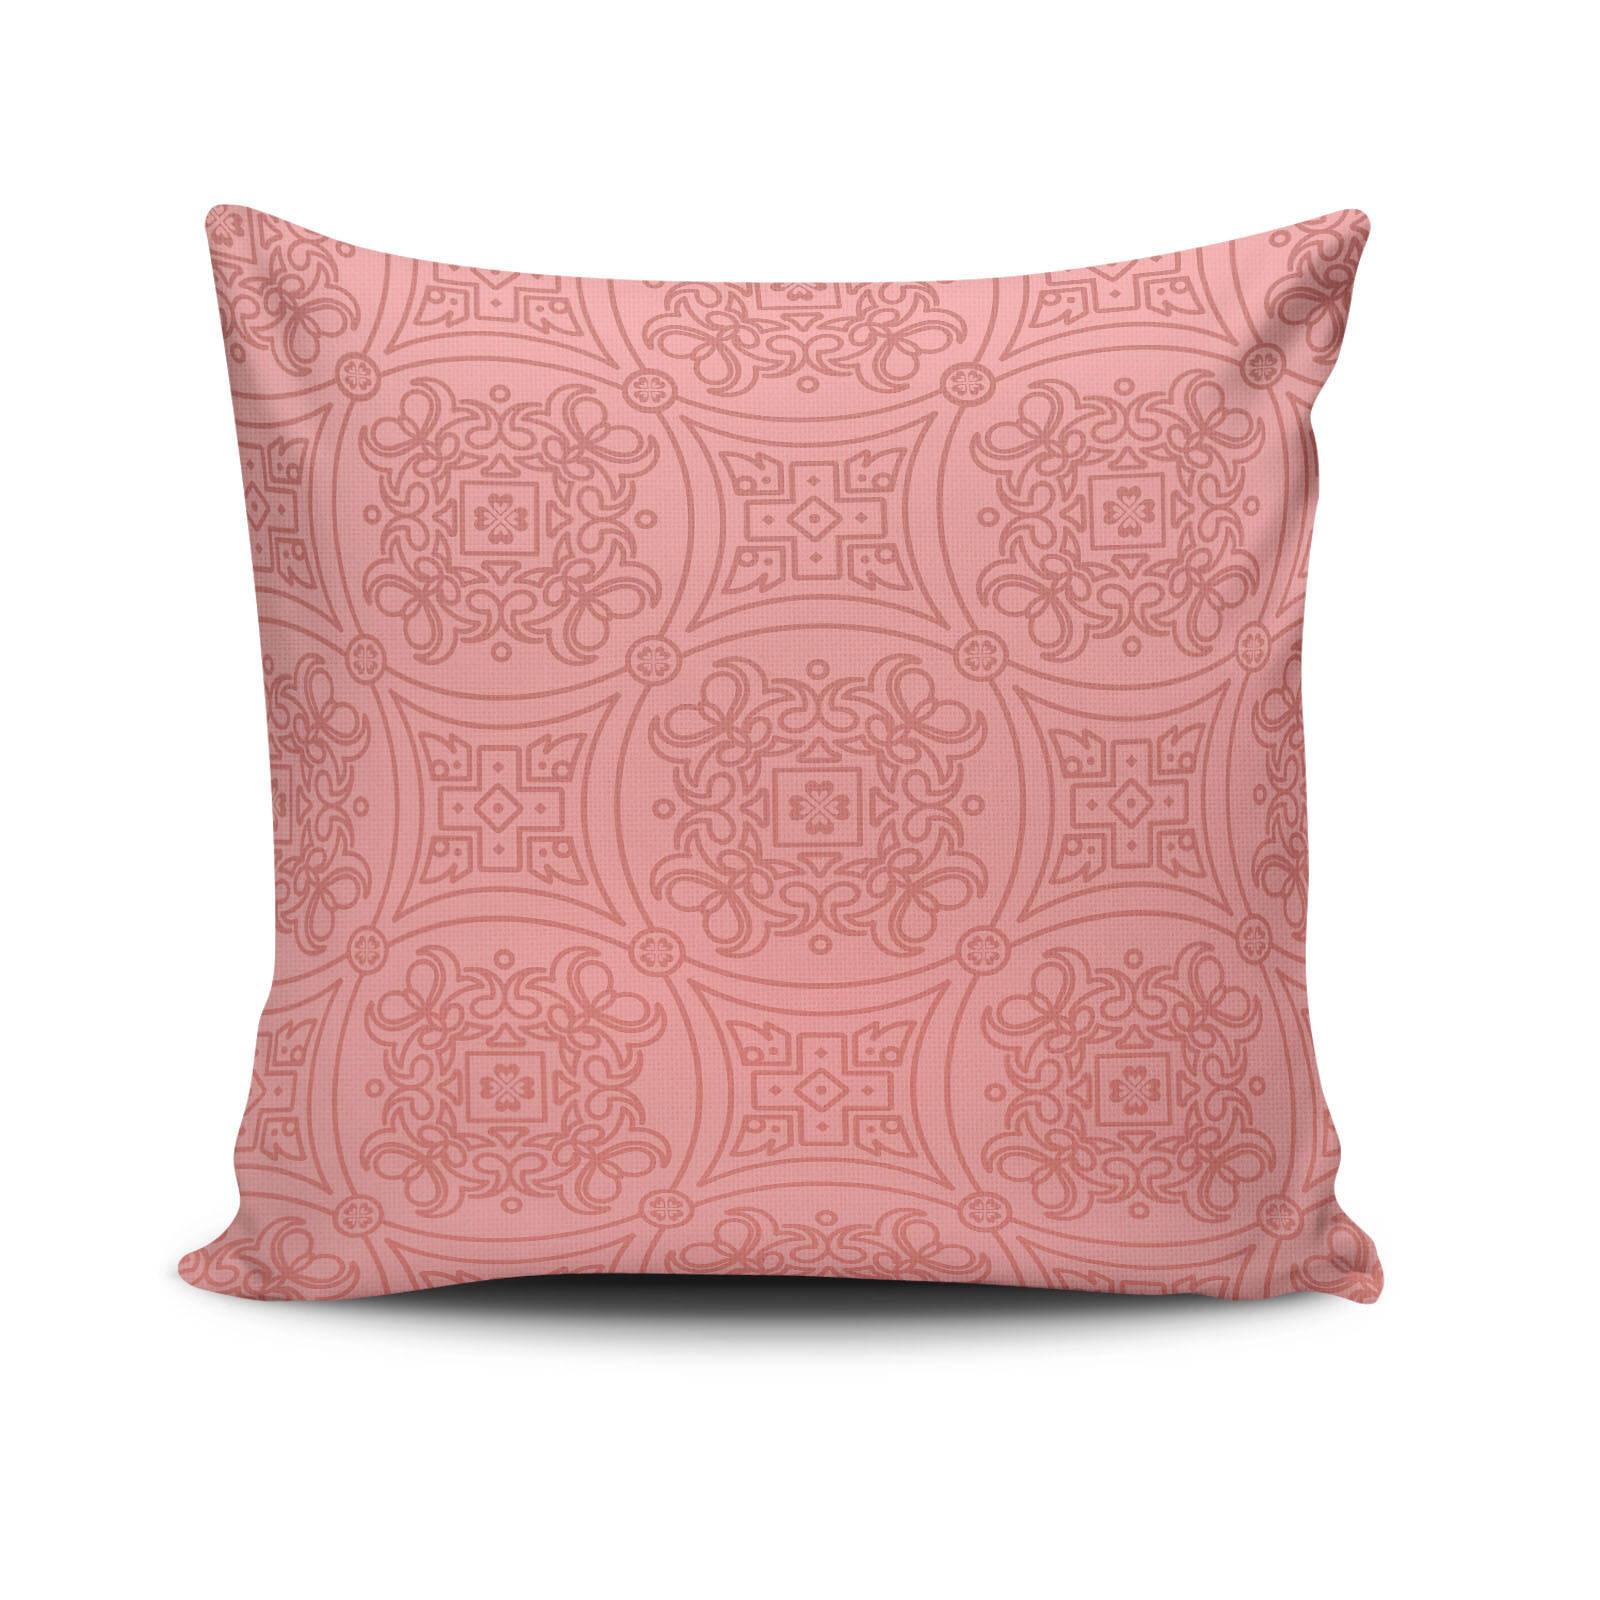 Perna decorativa Spiffy, Dimensiune: 45 x 45 cm, Material exterior: 50% bumbac / 50% poliester 425SPF0136